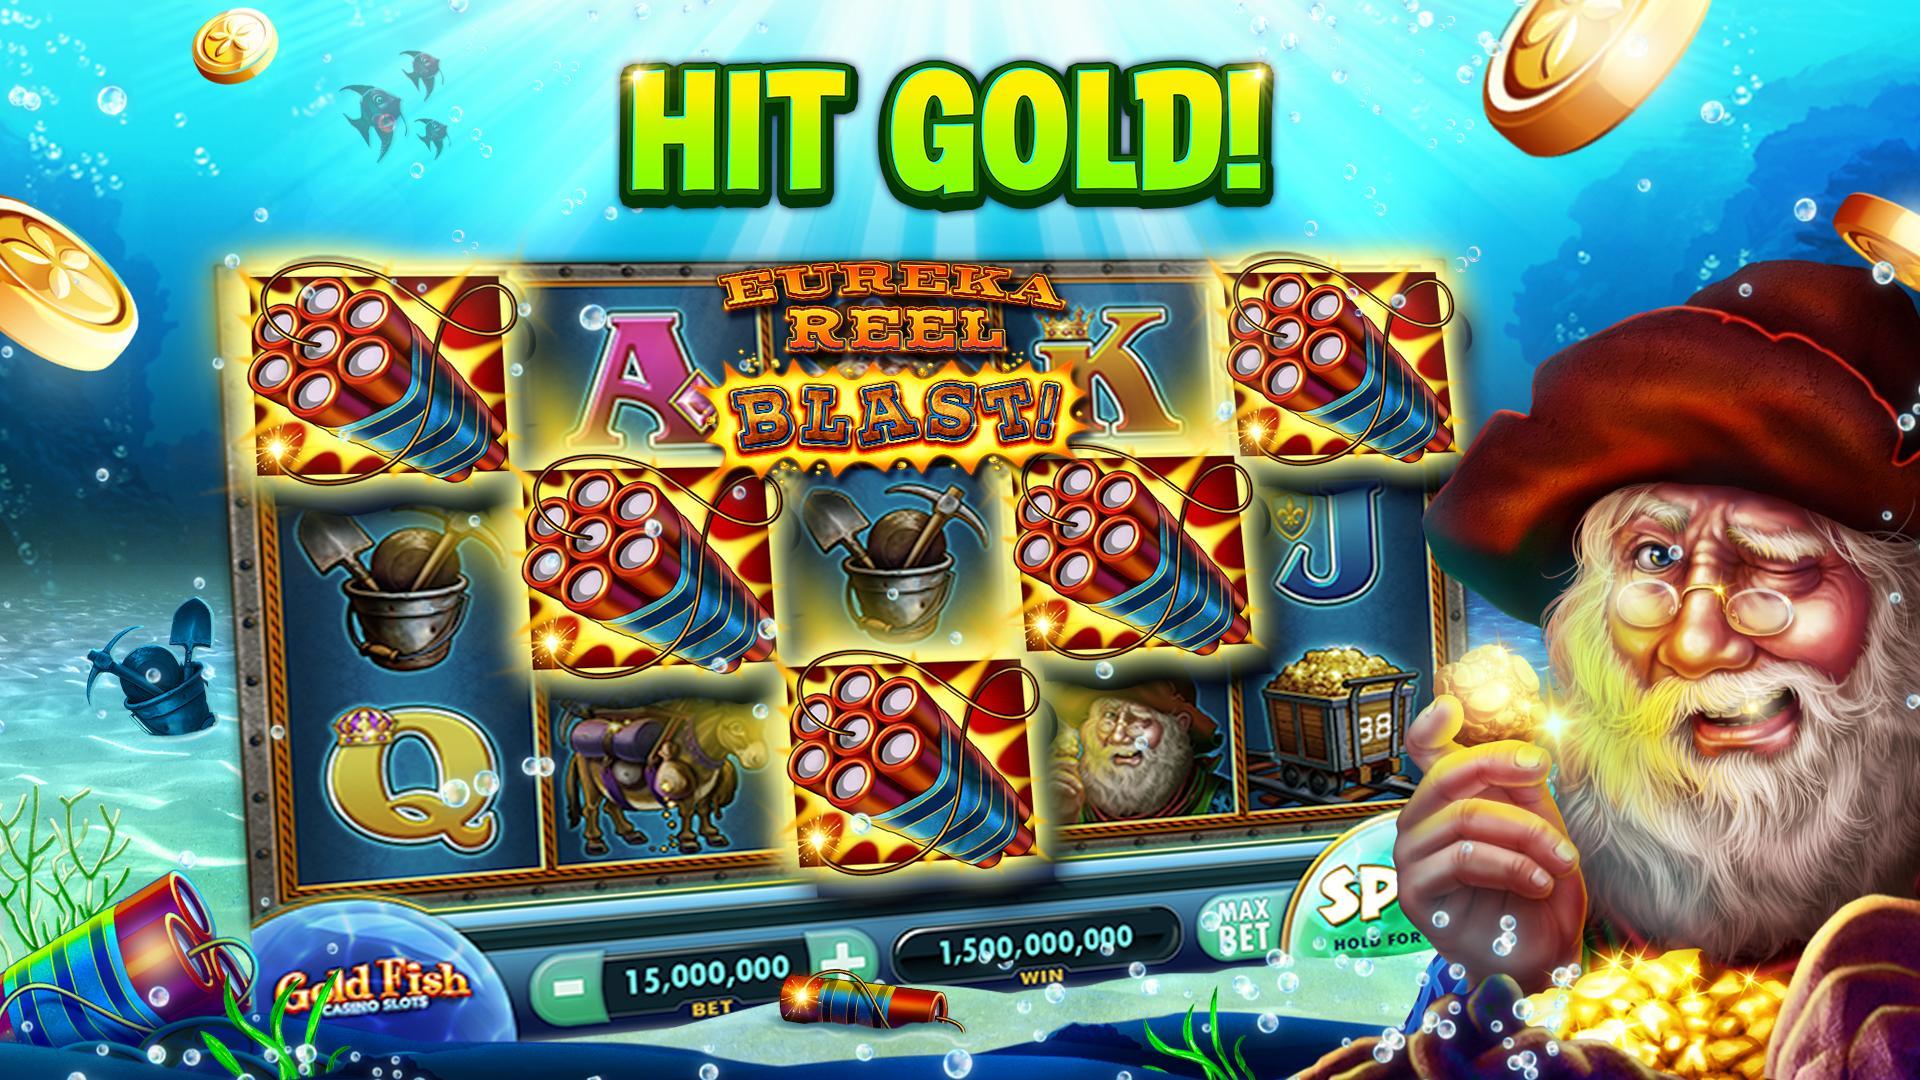 Gold Fish Casino Slots - FREE Slot Machine Games 25.09.00 Screenshot 15